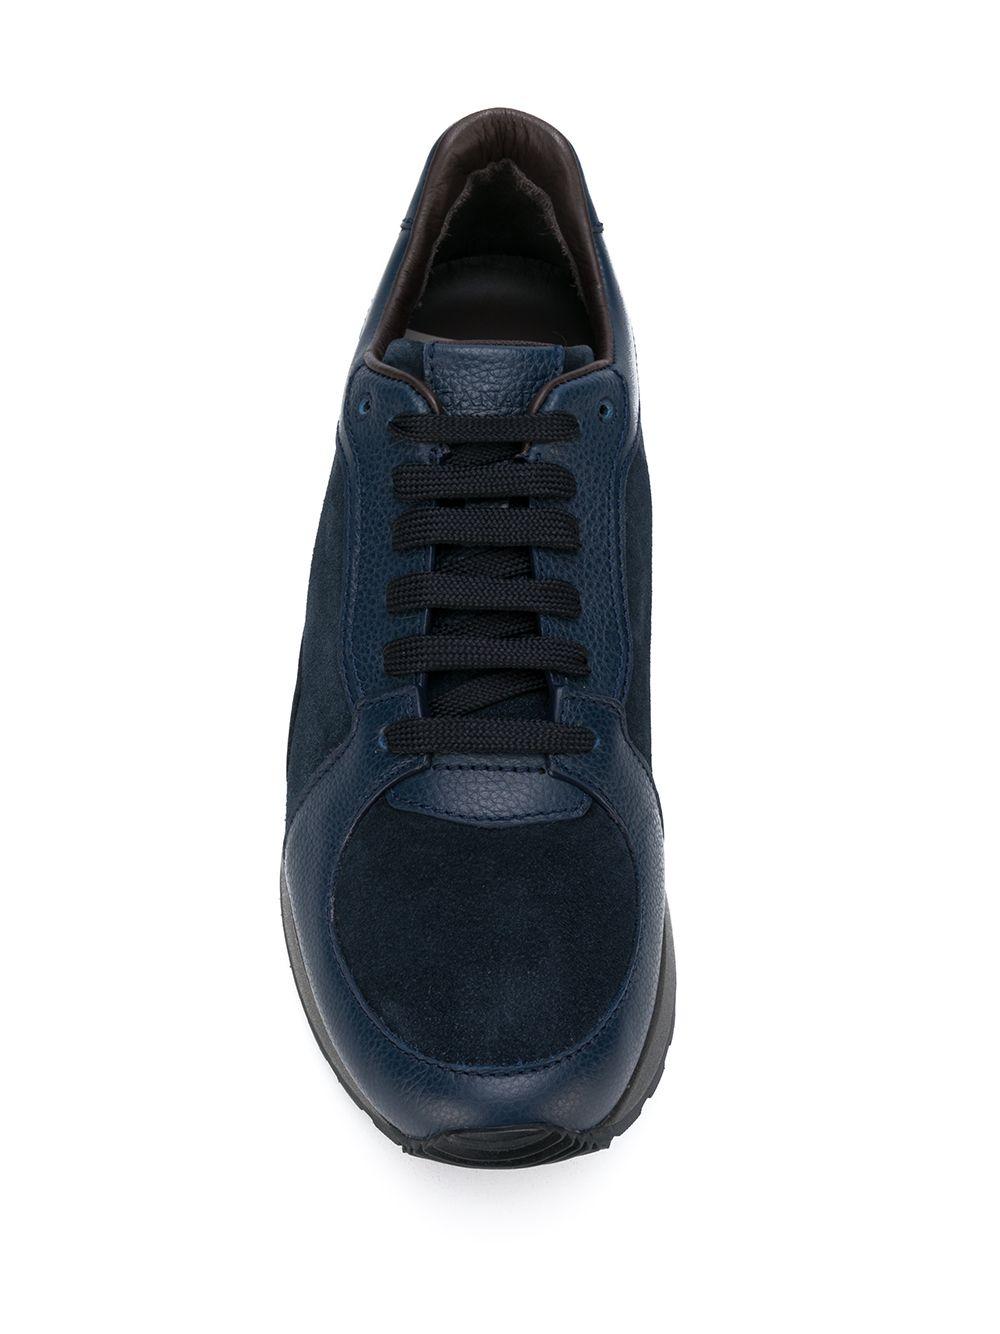 Canali | Canali кроссовки на шнуровке | Clouty